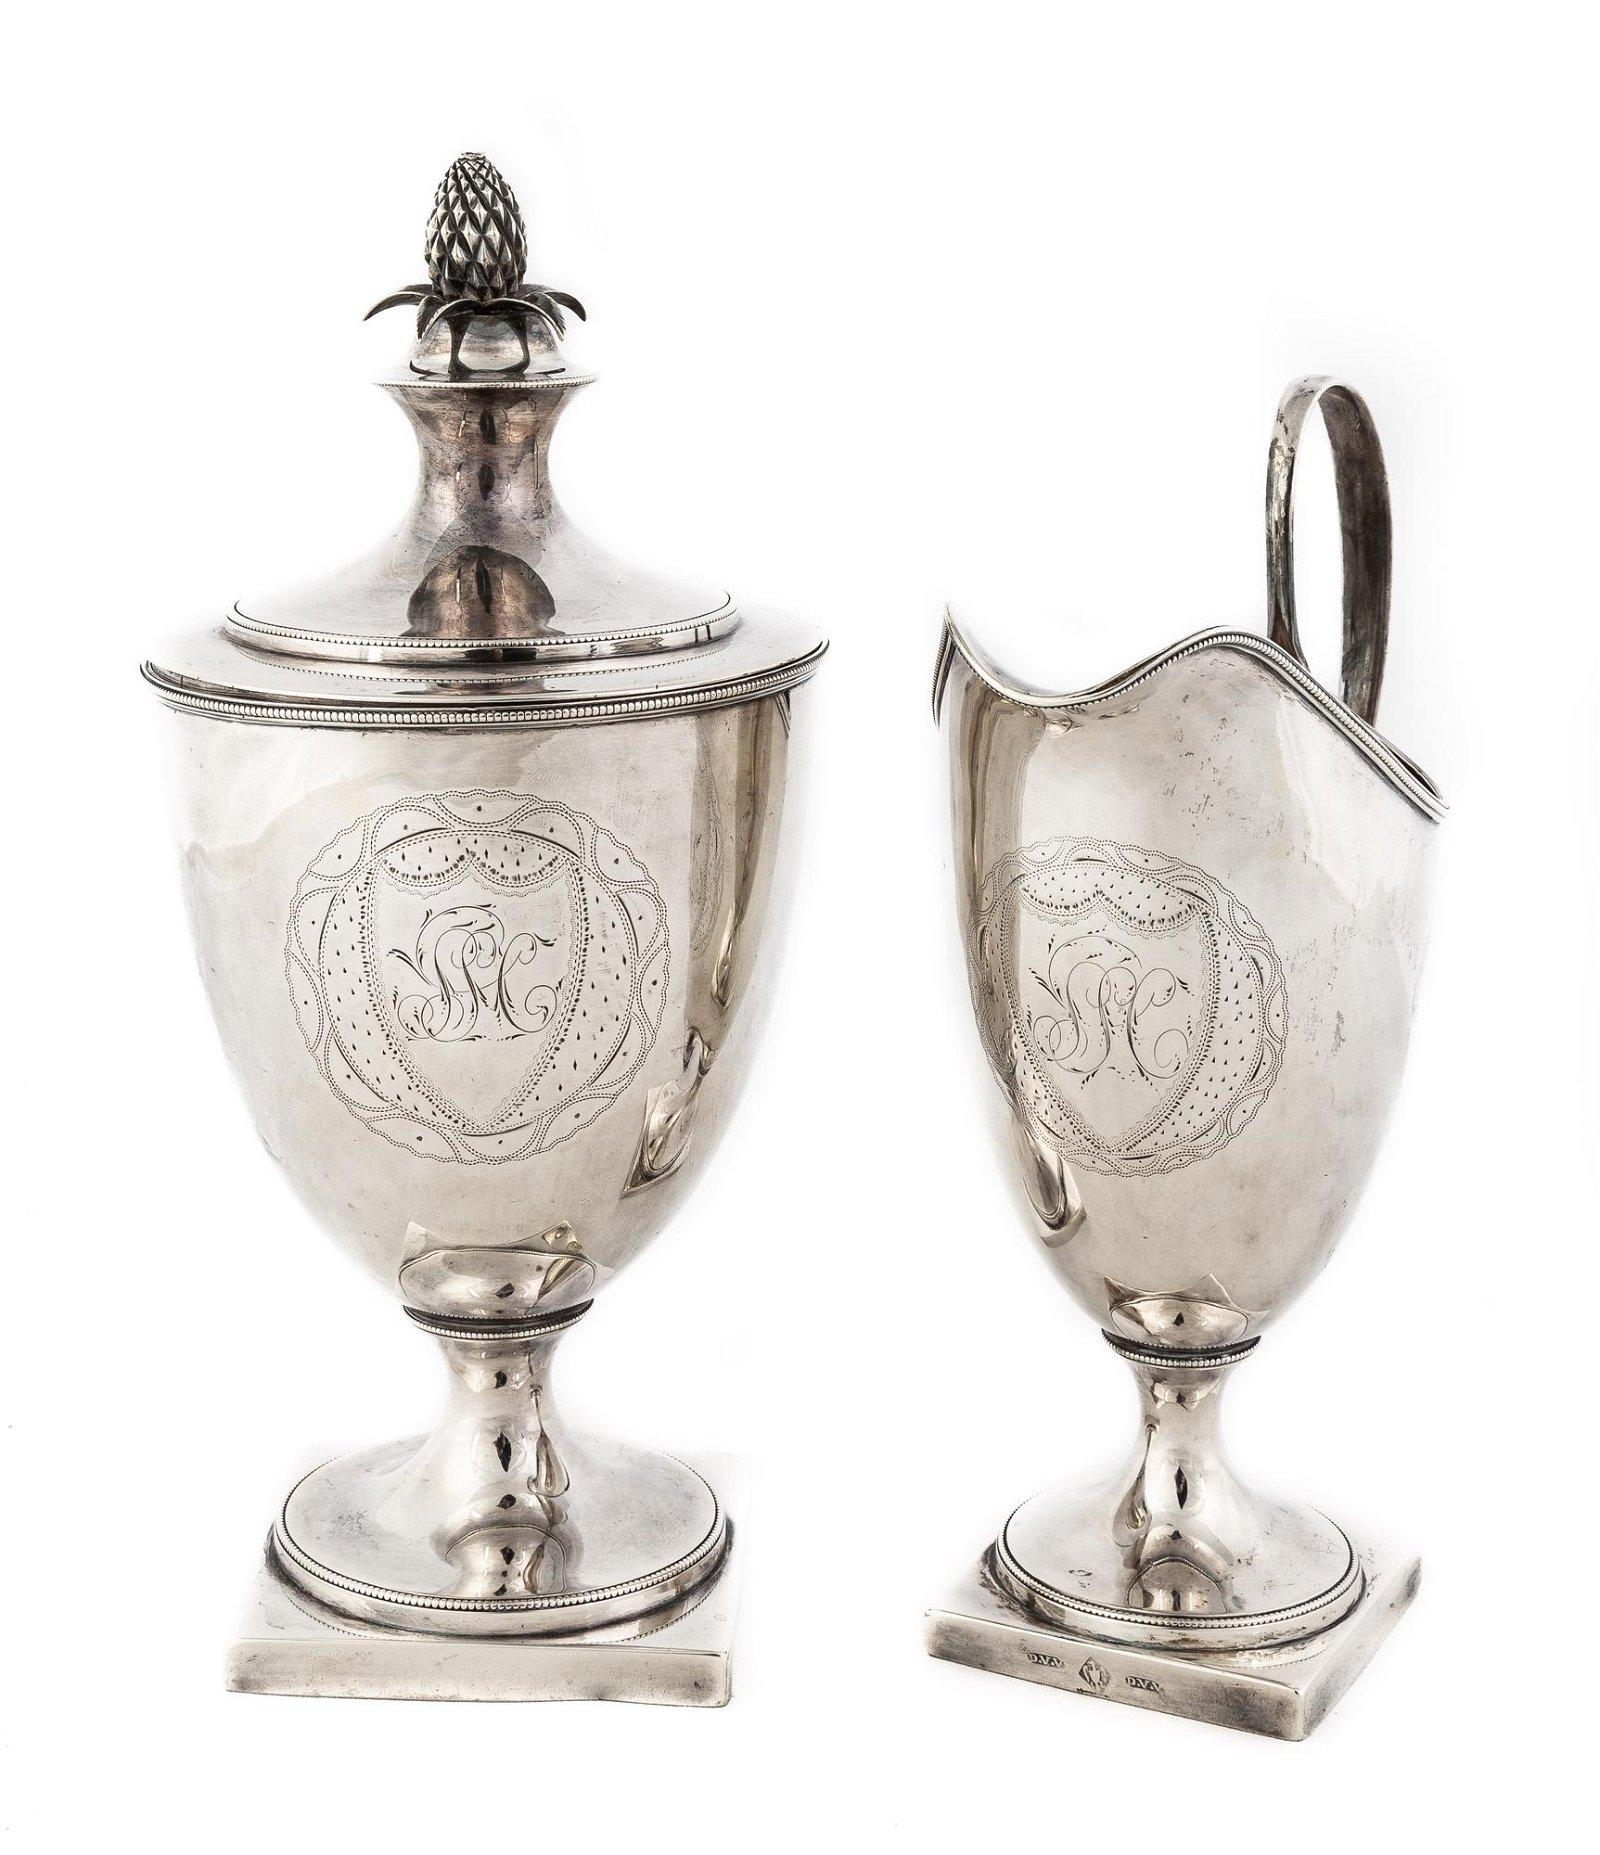 Early American Silver Covered Sugar & Creamer